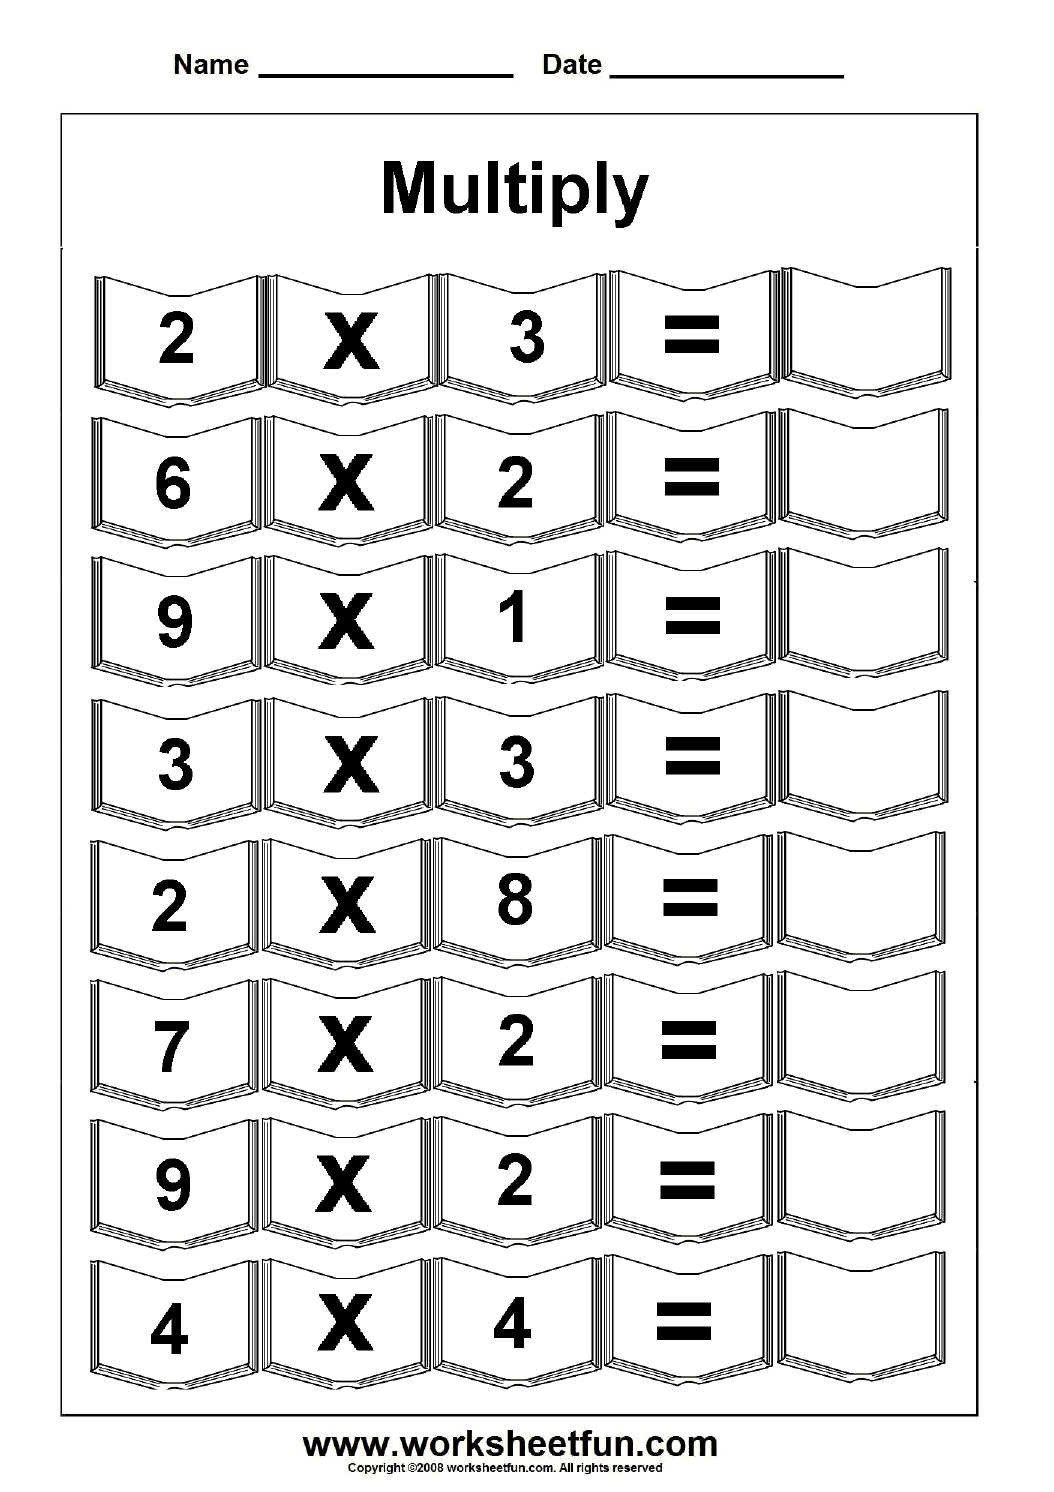 Multiplication – 5 Worksheets / Free Printable Worksheets – Worksheetfun - Www Free Printable Worksheets